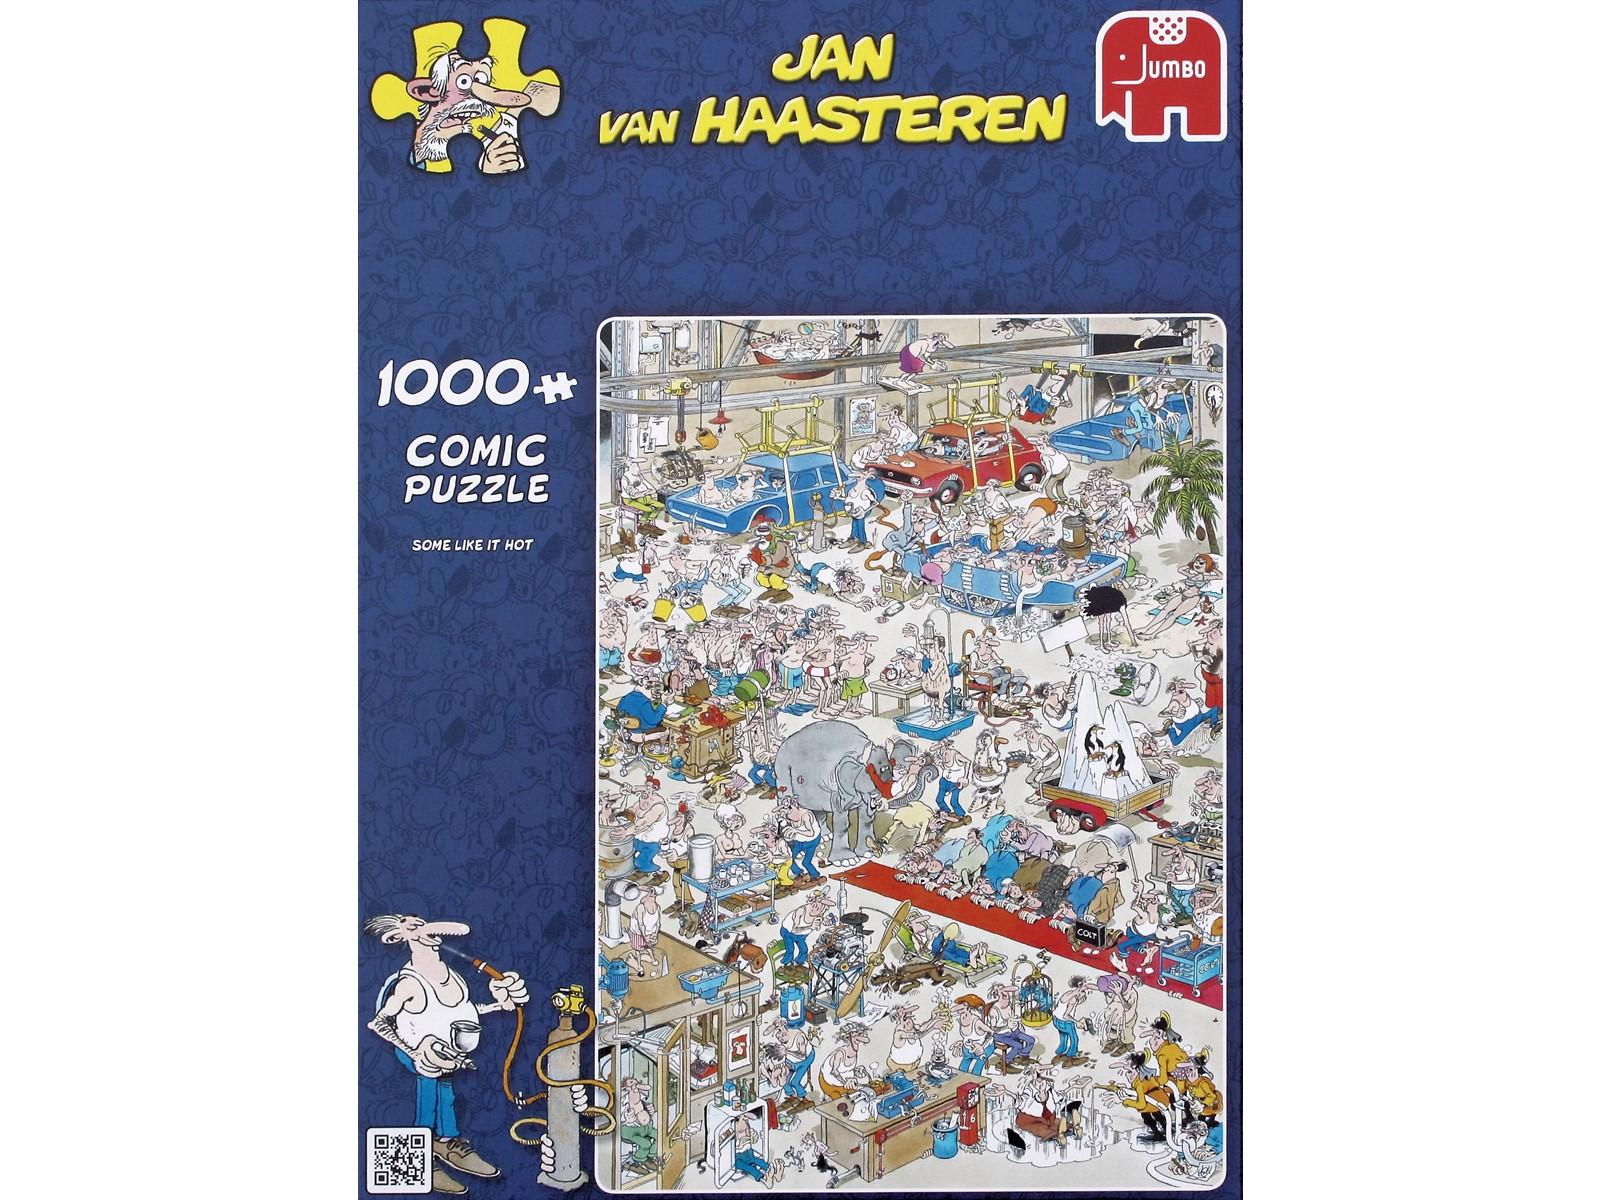 Jan Van Haasteren - Some like it hot - 1000 Piece Puzzle (81453A)